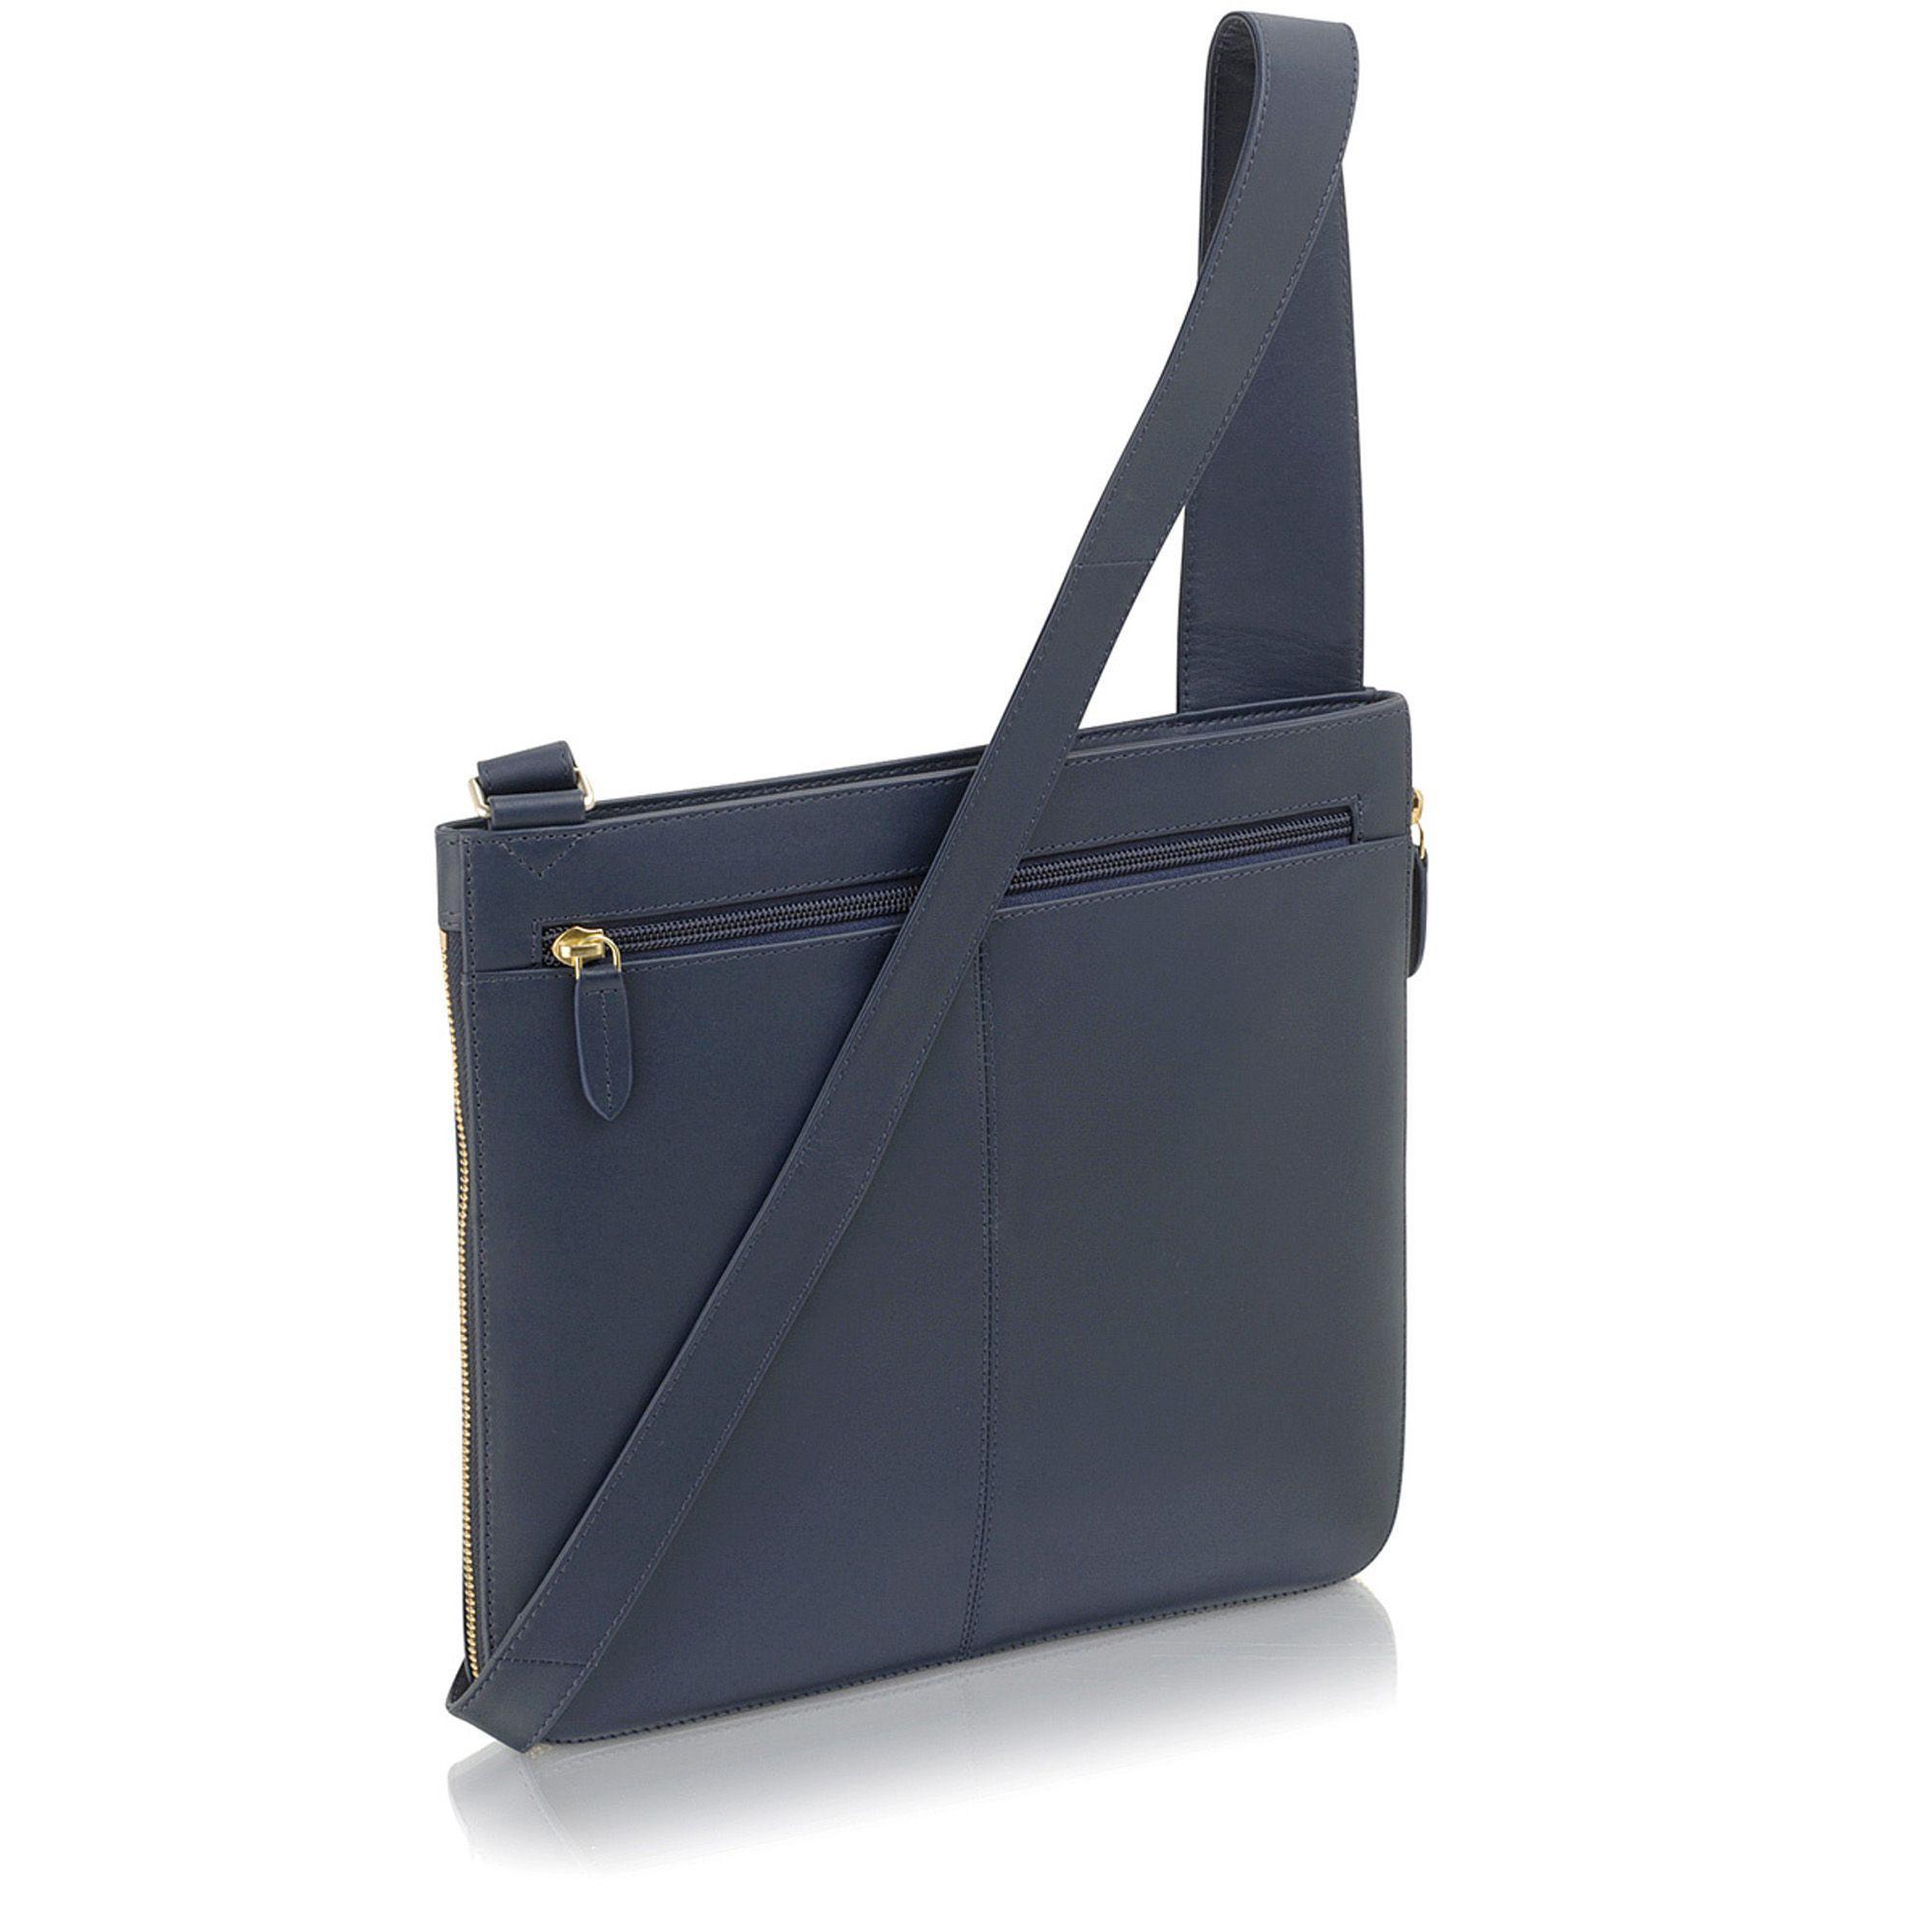 Radley - Blue Pockets Large Zip-top Cross Body Bag - Lyst. View fullscreen 6b179843f2675